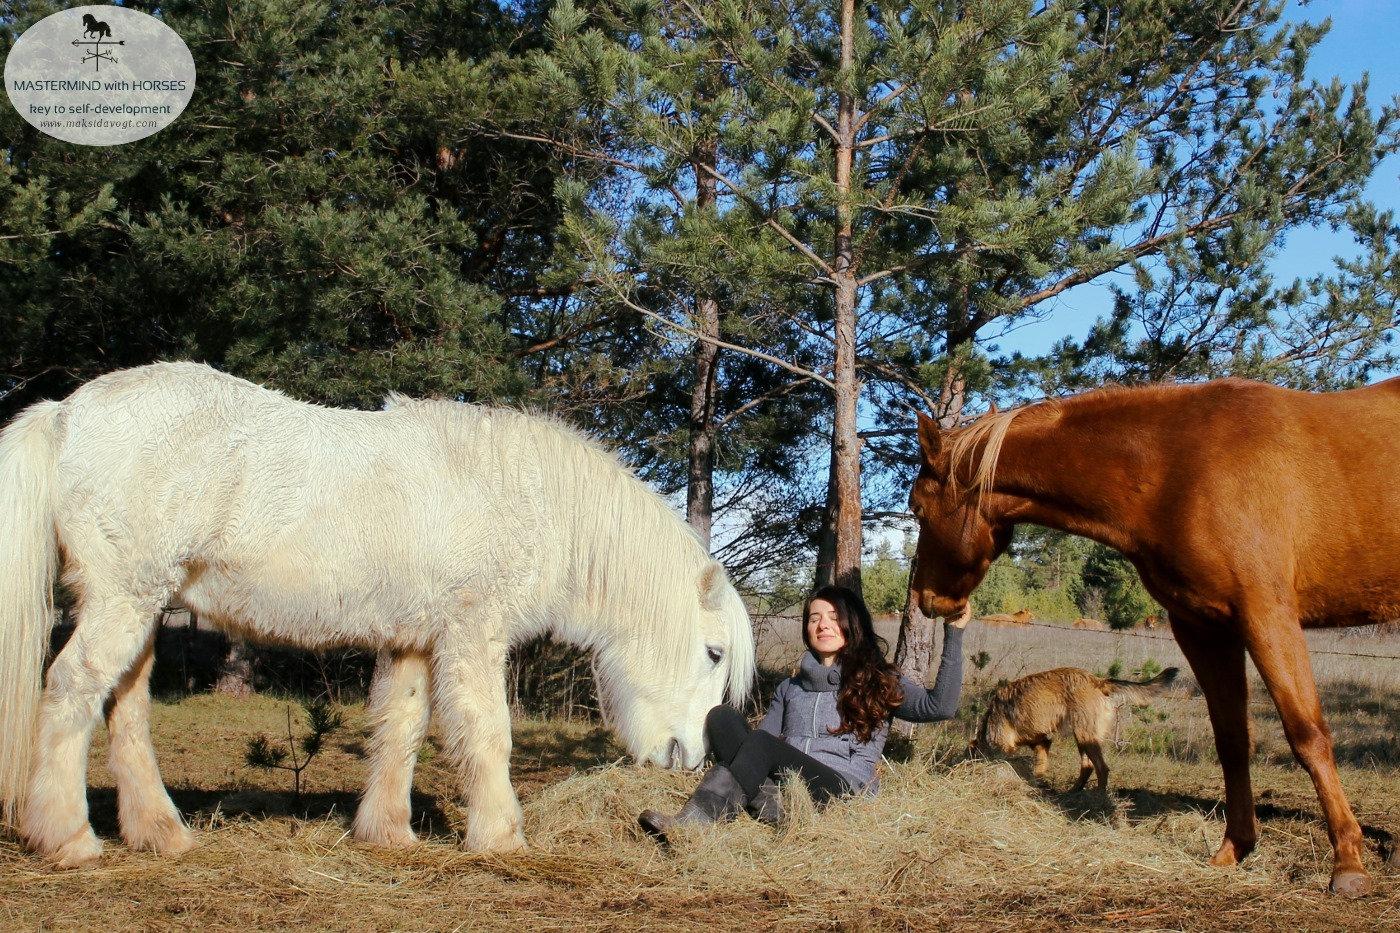 MASTERMIND with HORSES